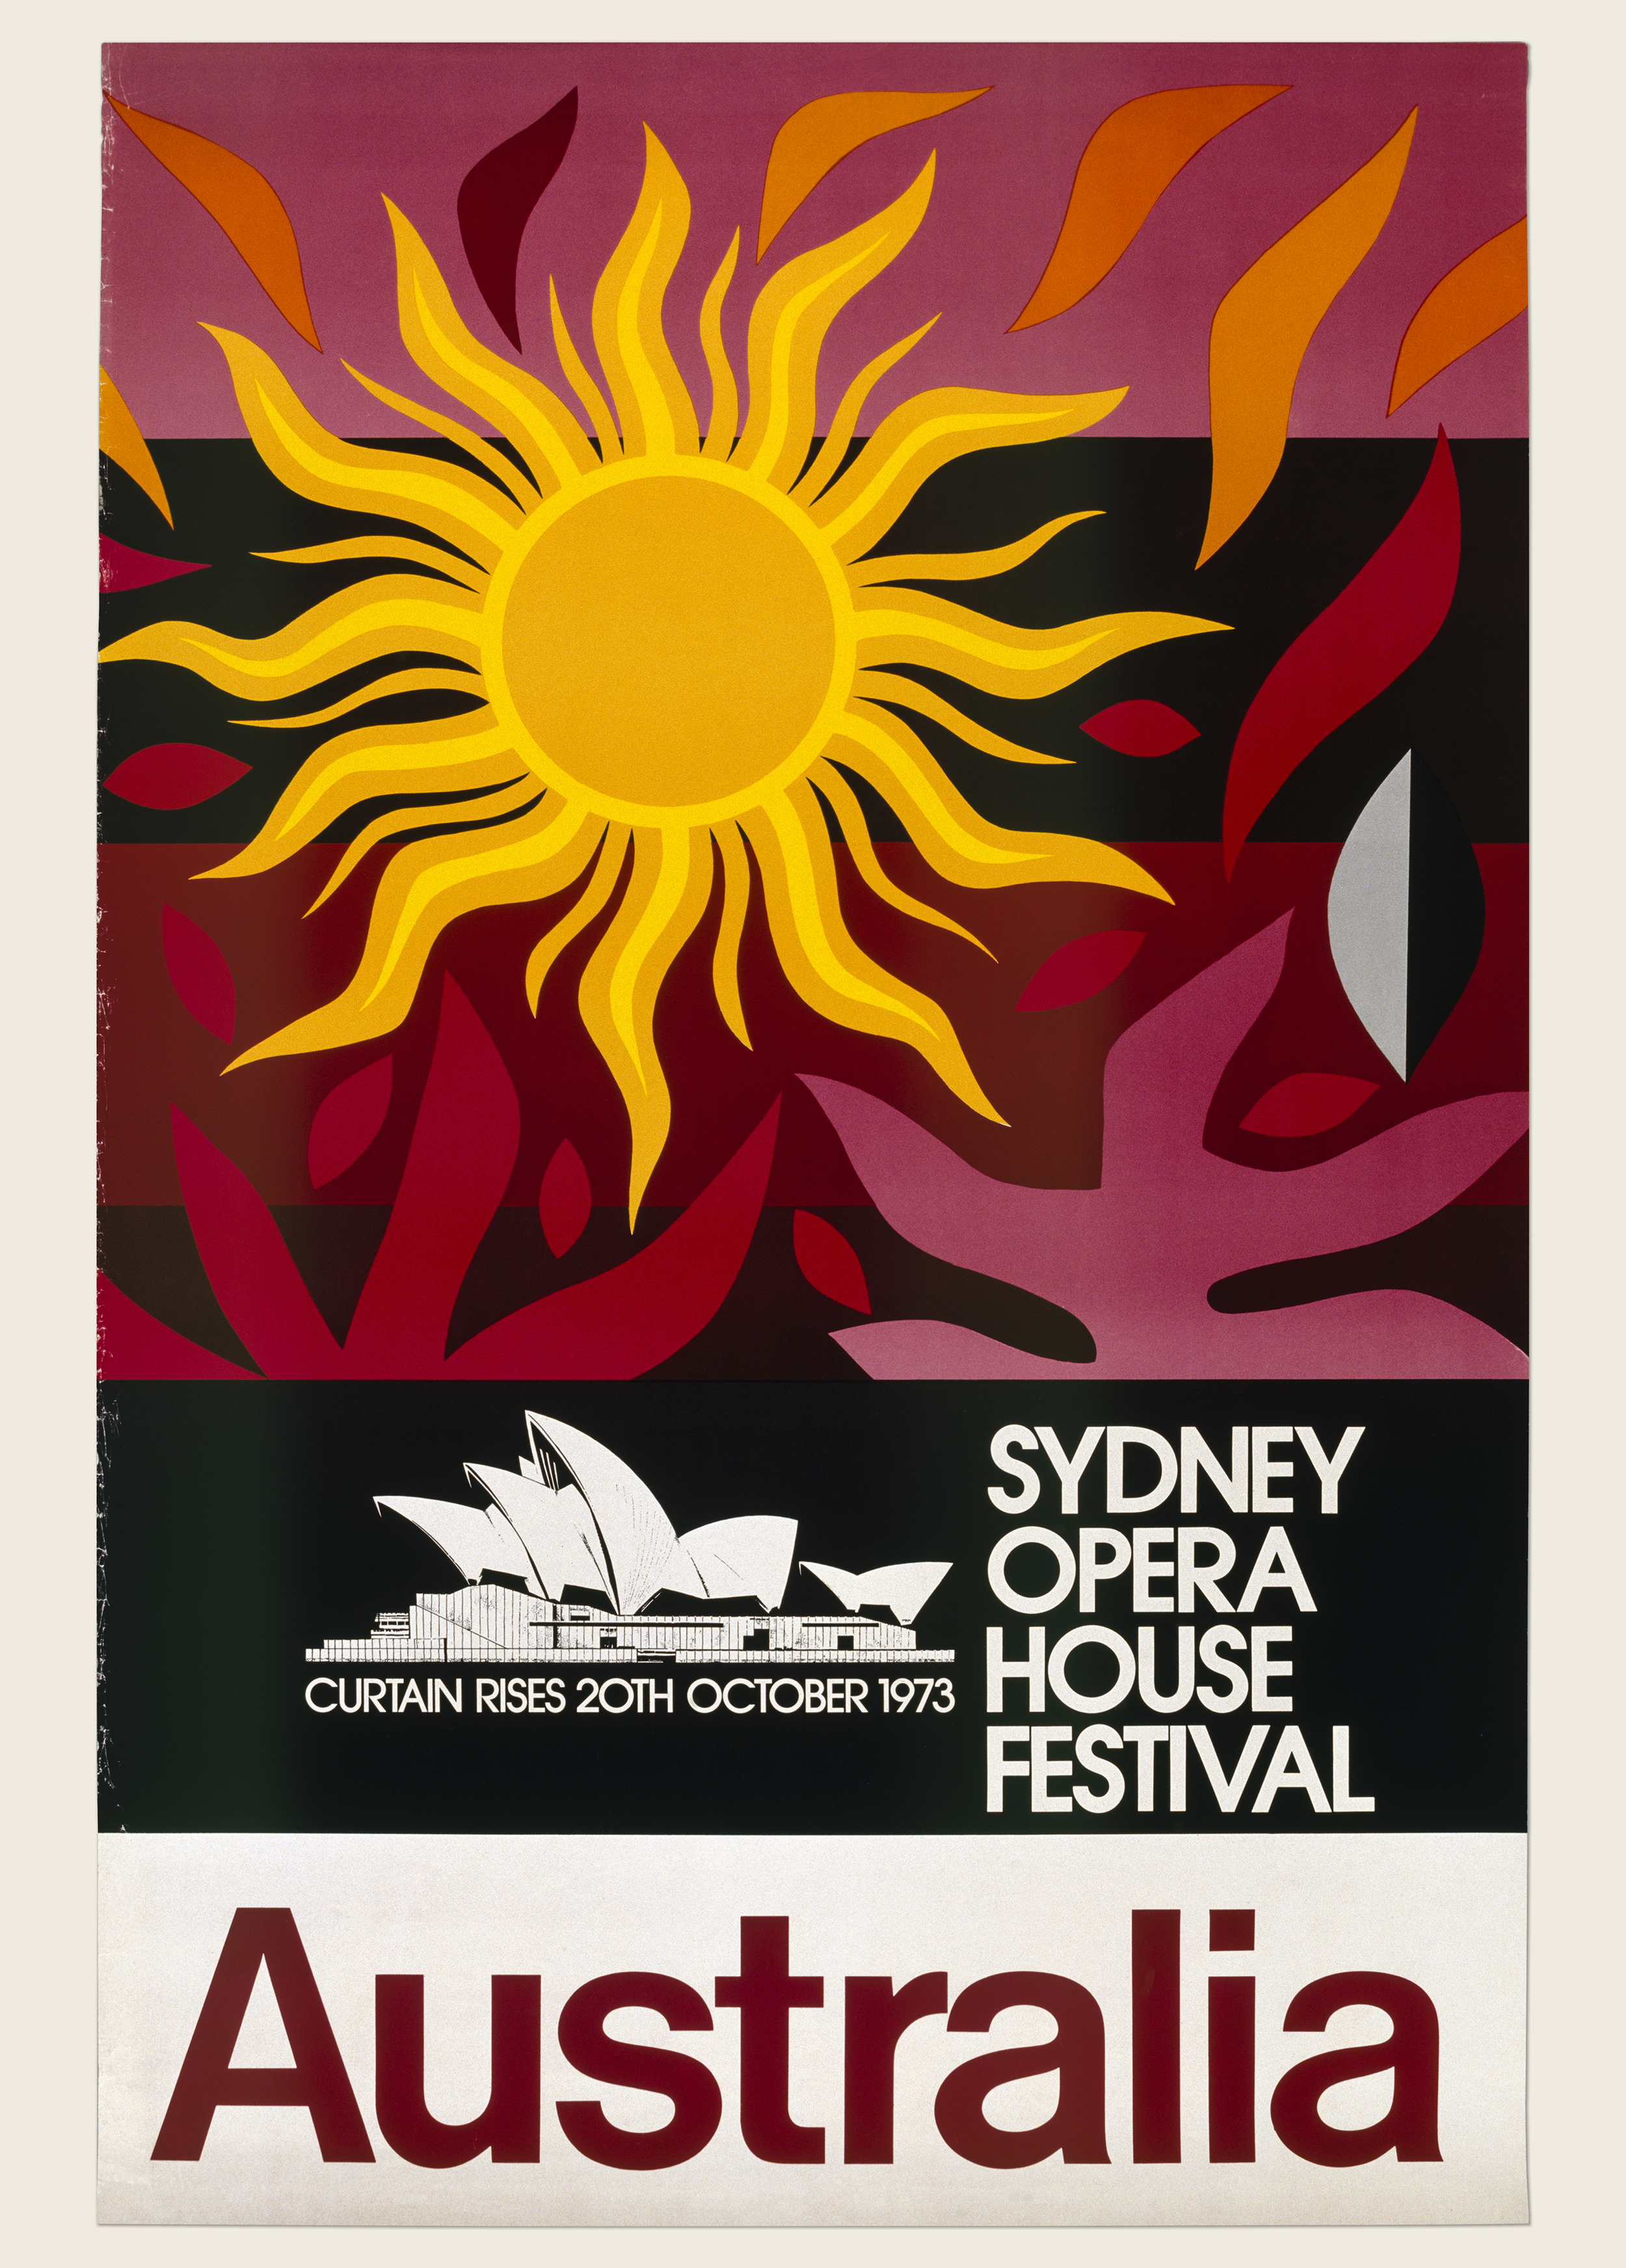 Sydney Opera House Festival Poster